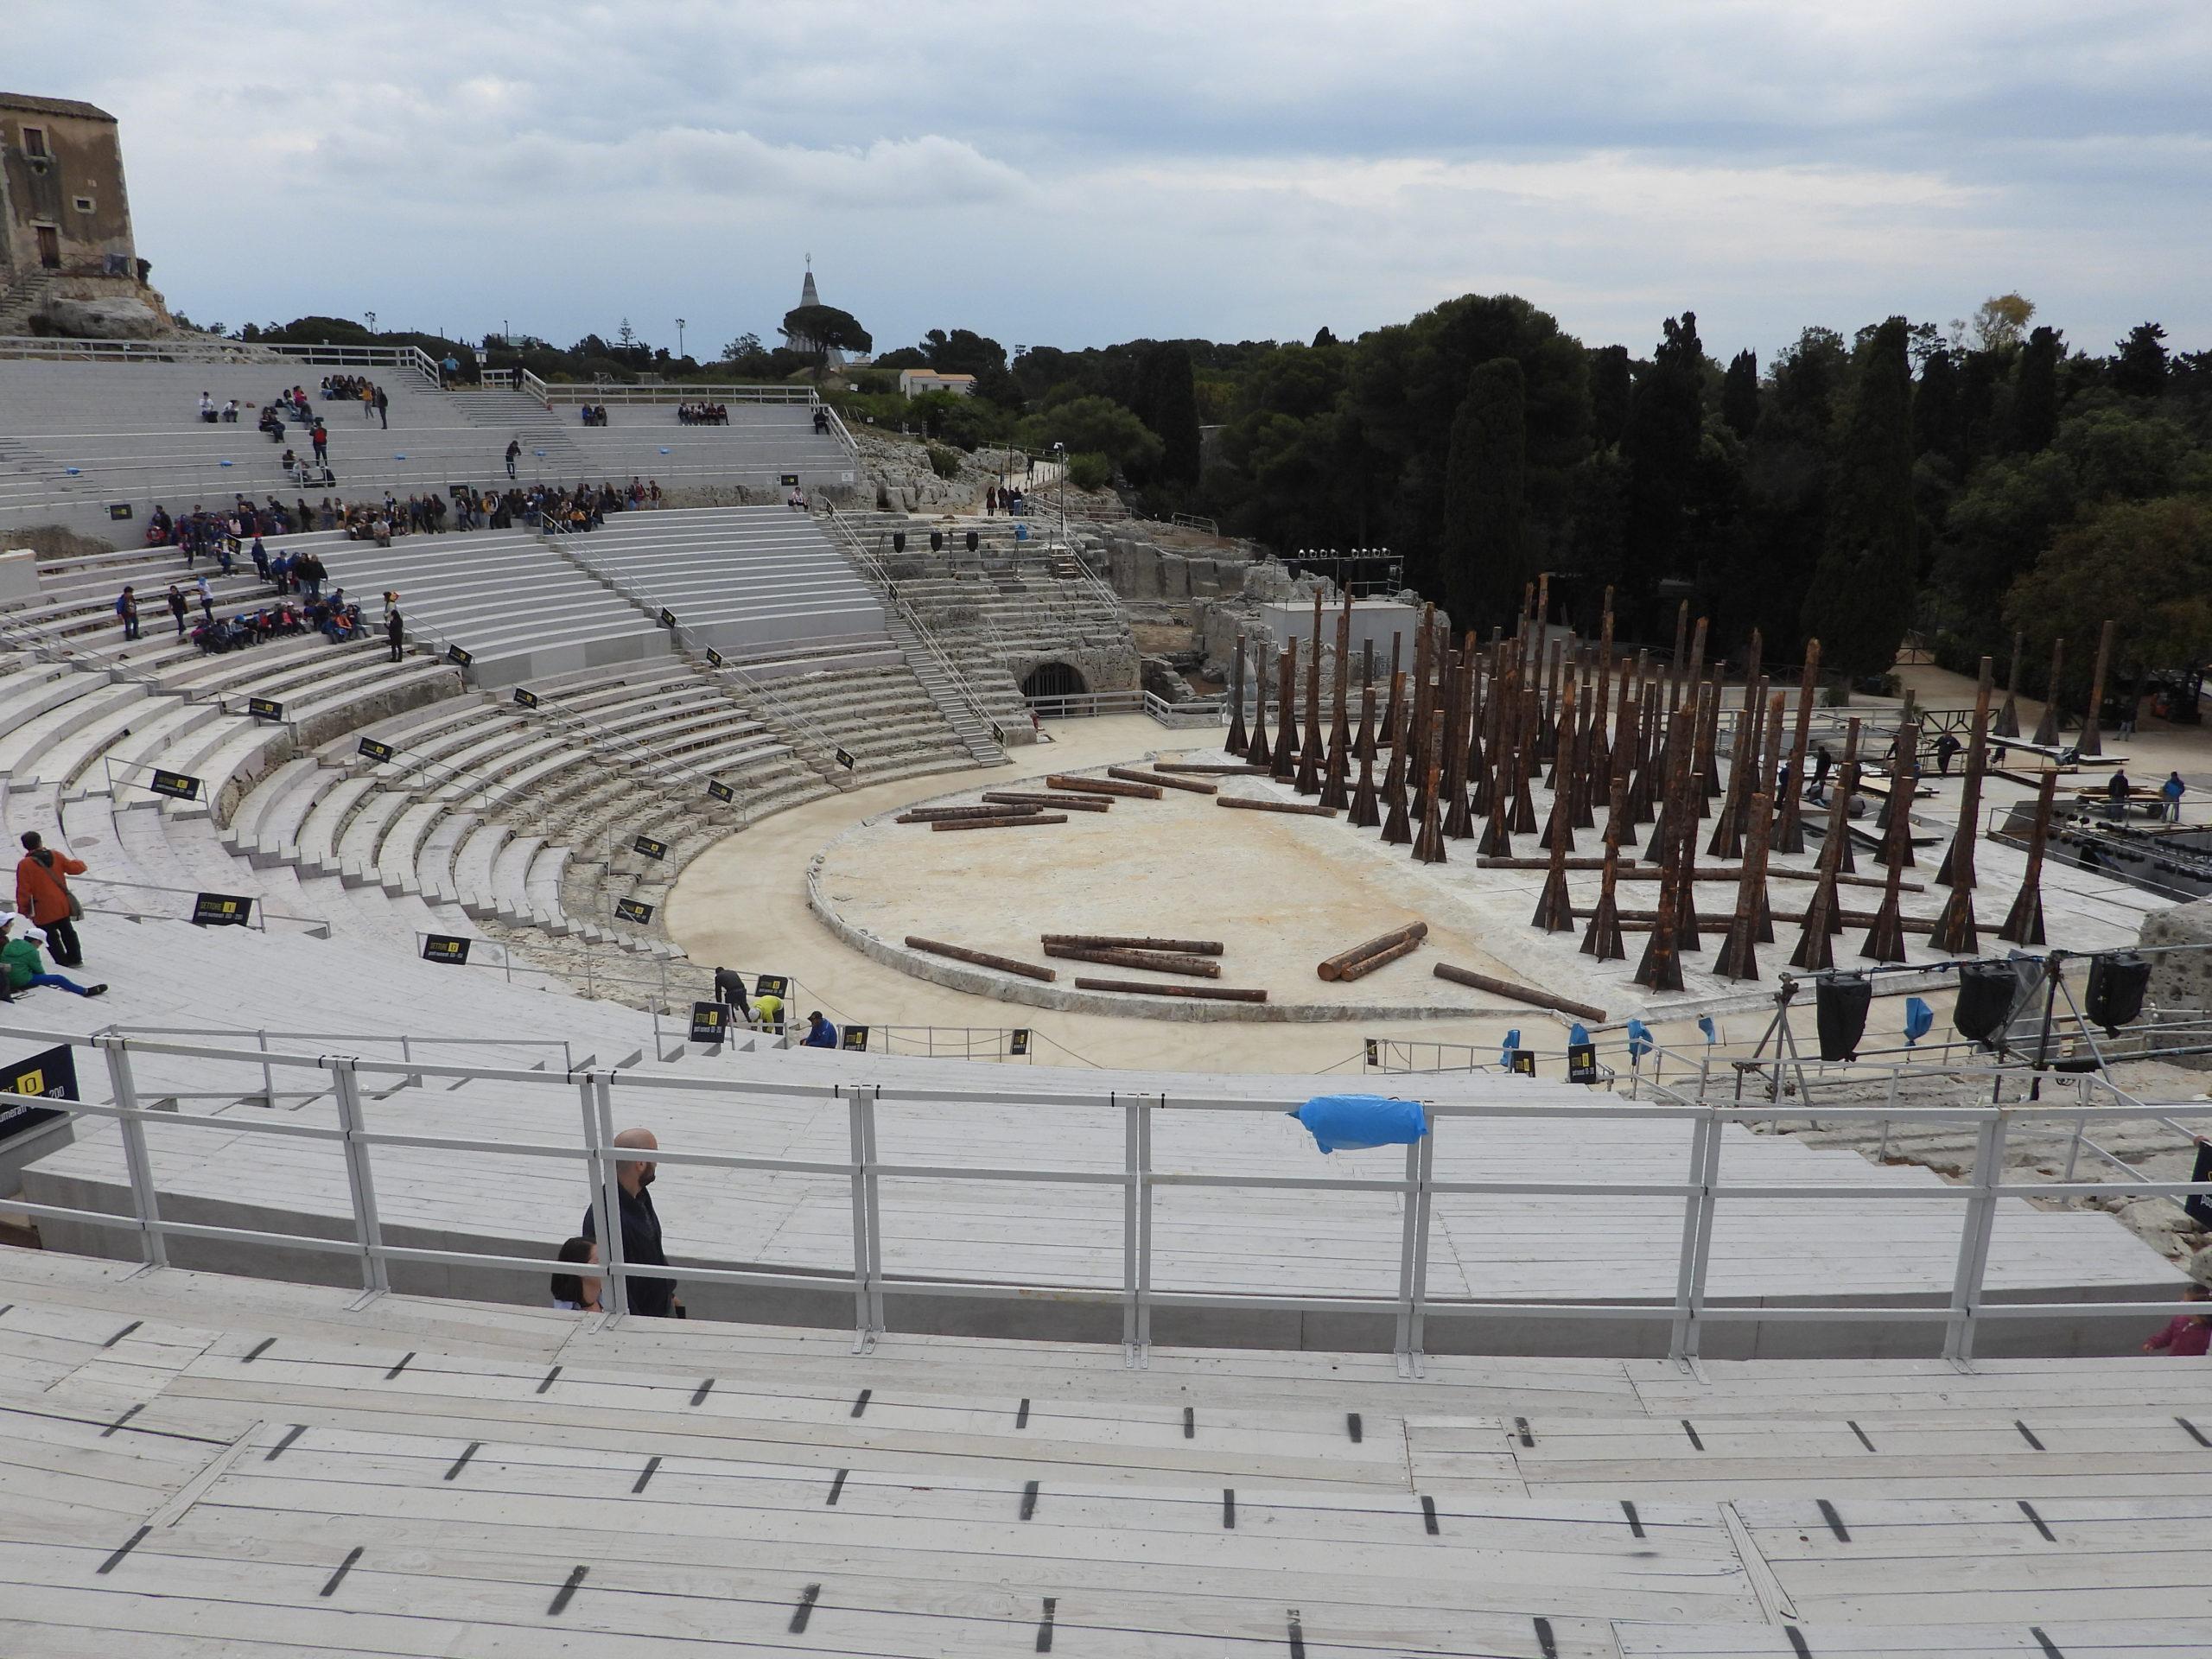 14 mai - SYRACUSE - Parco Archeologico Della Neapolis (10)